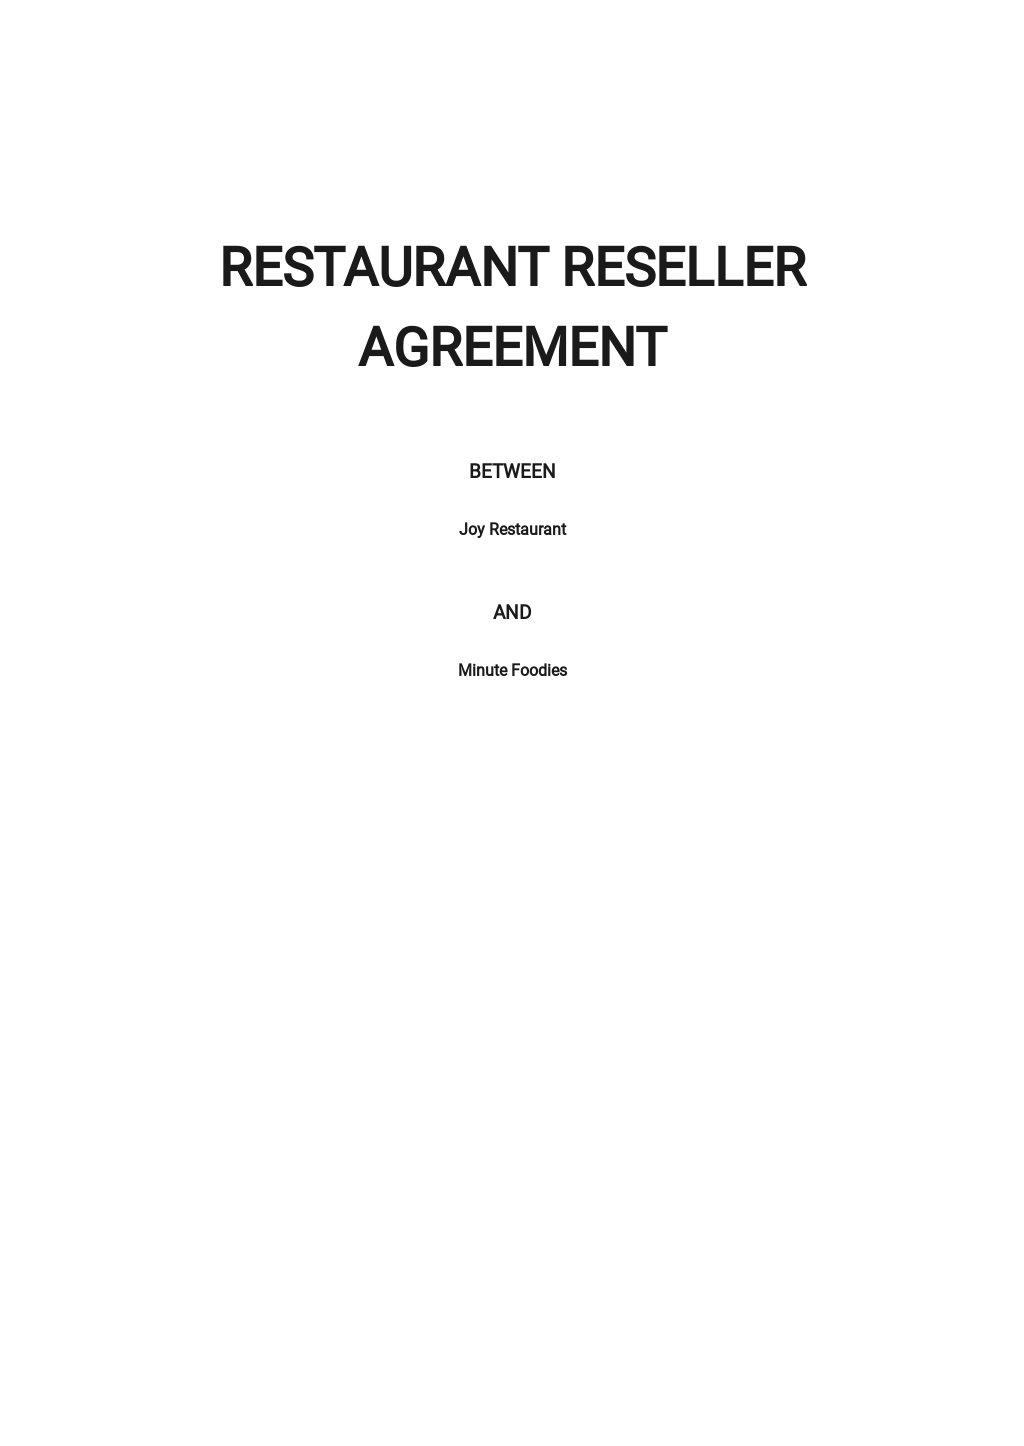 Restaurant Reseller Agreement Template